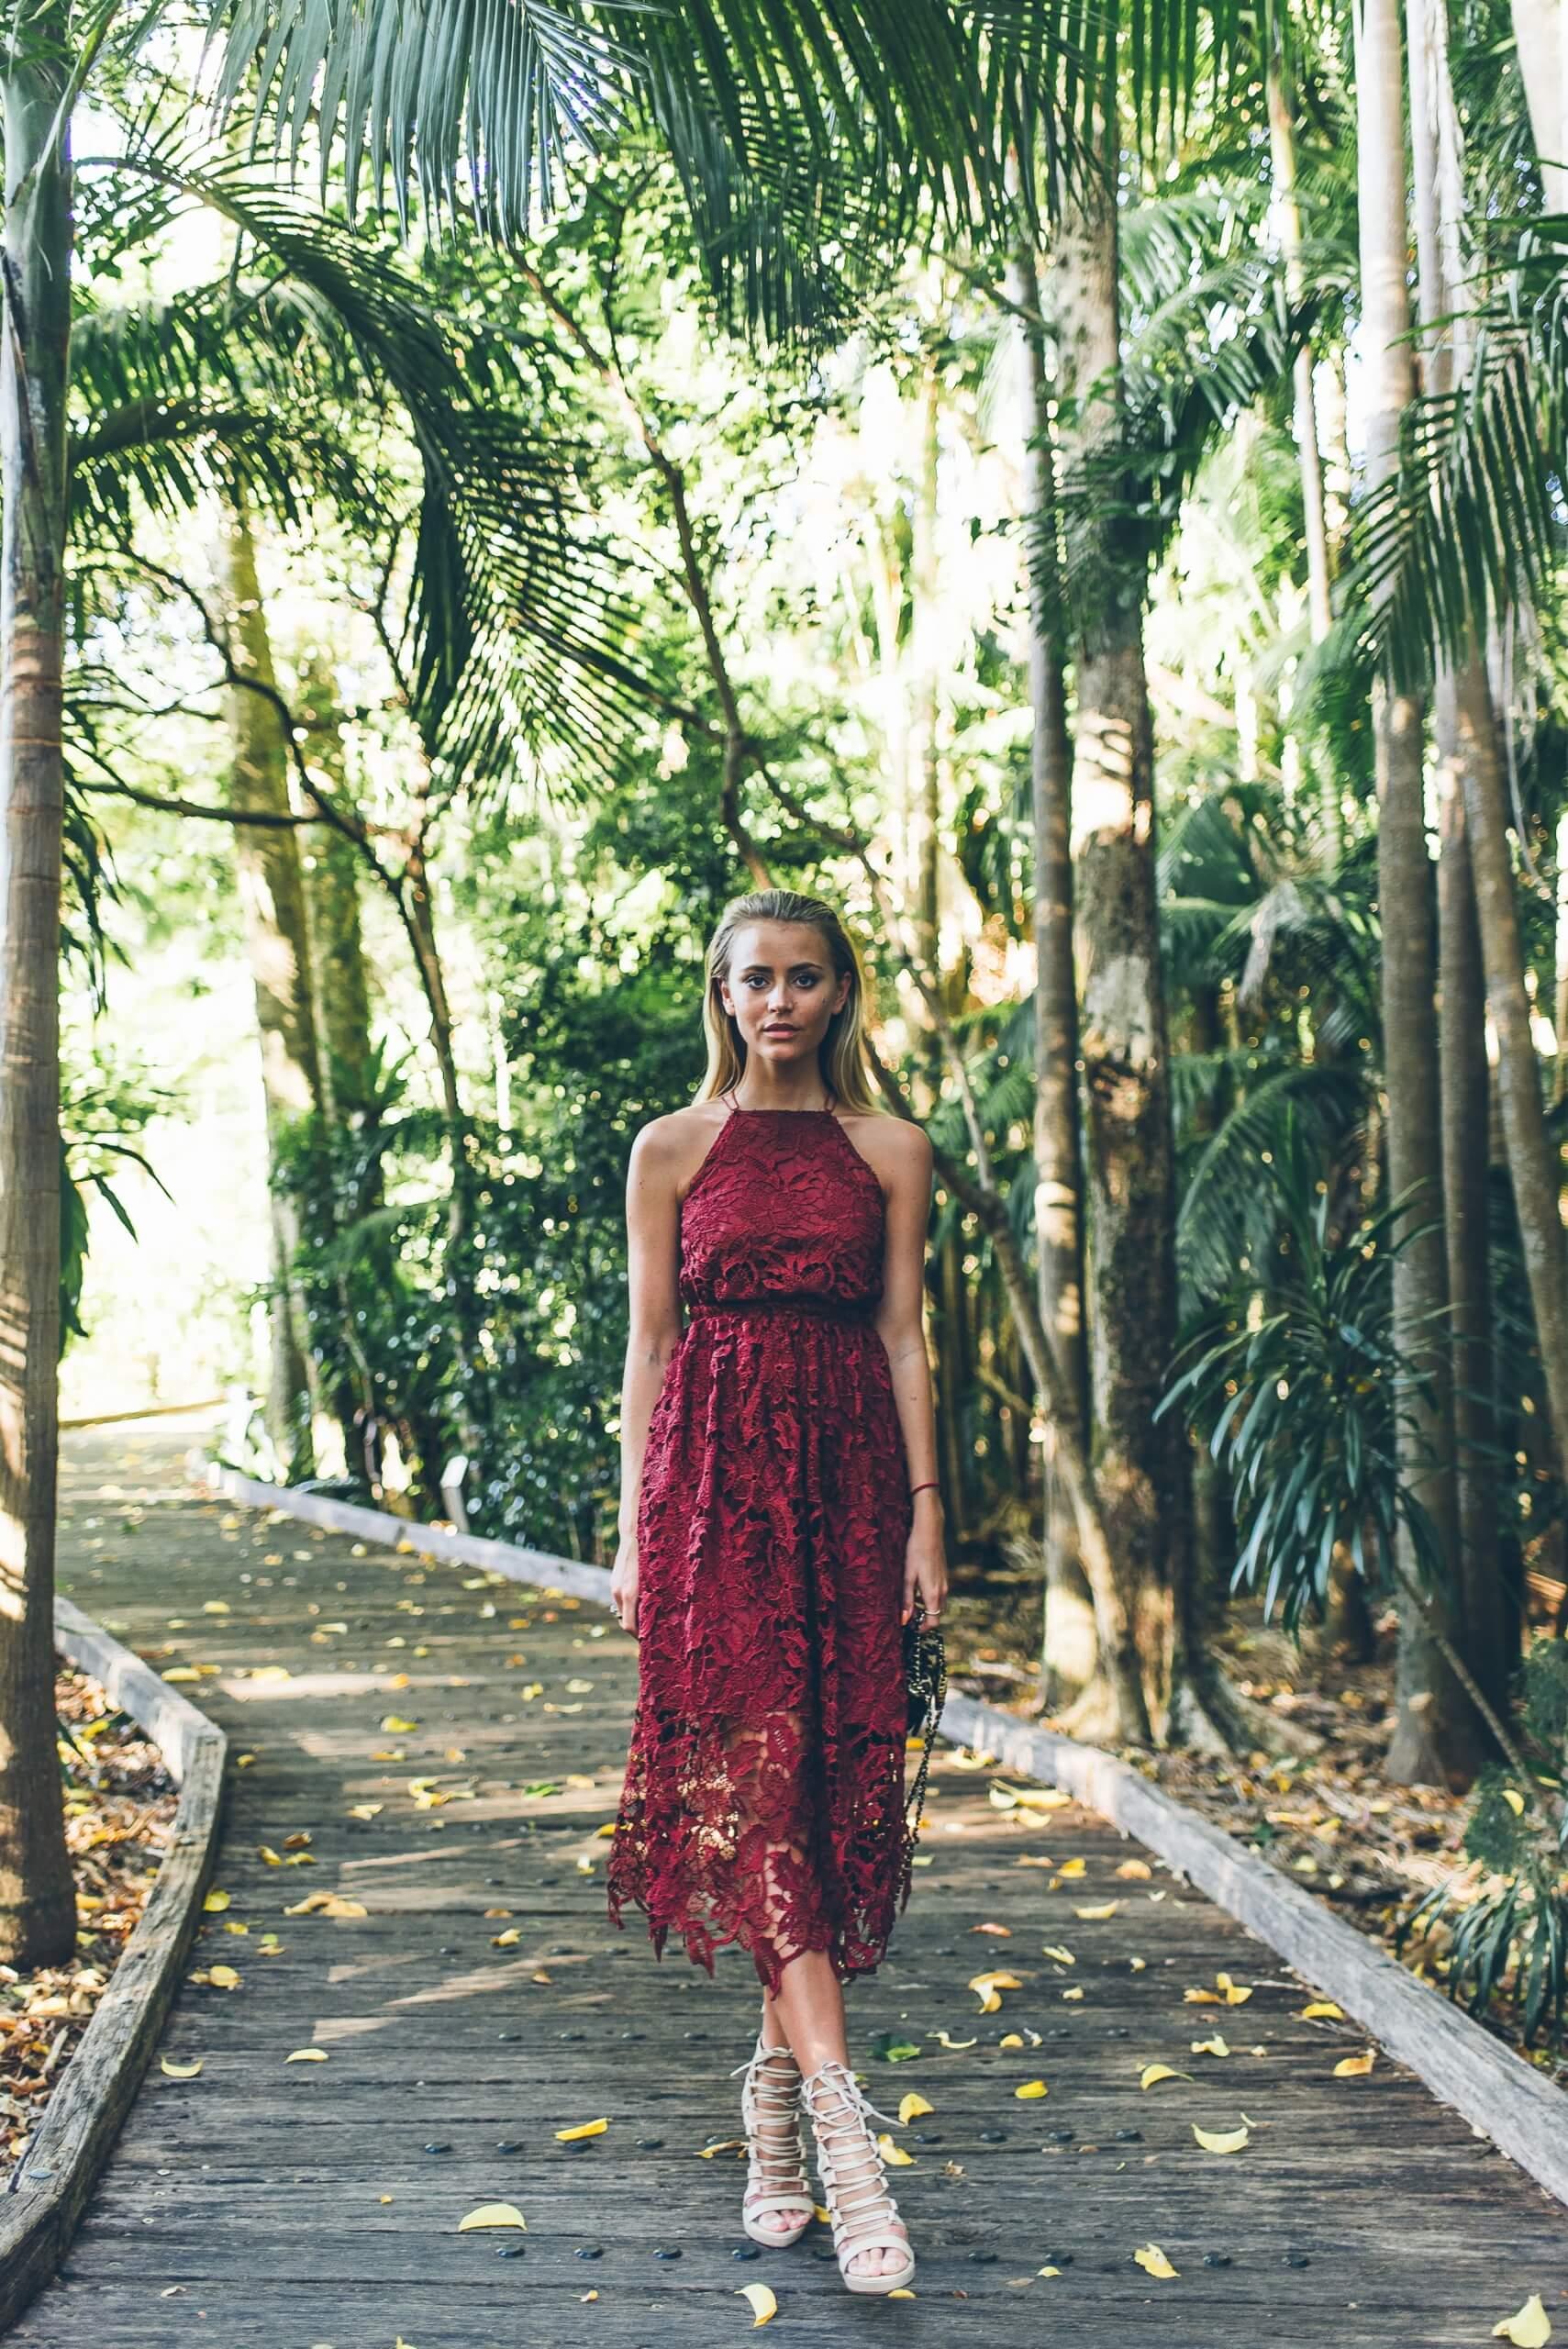 janni-deler-jungle-look-dress-byronDSC_3696